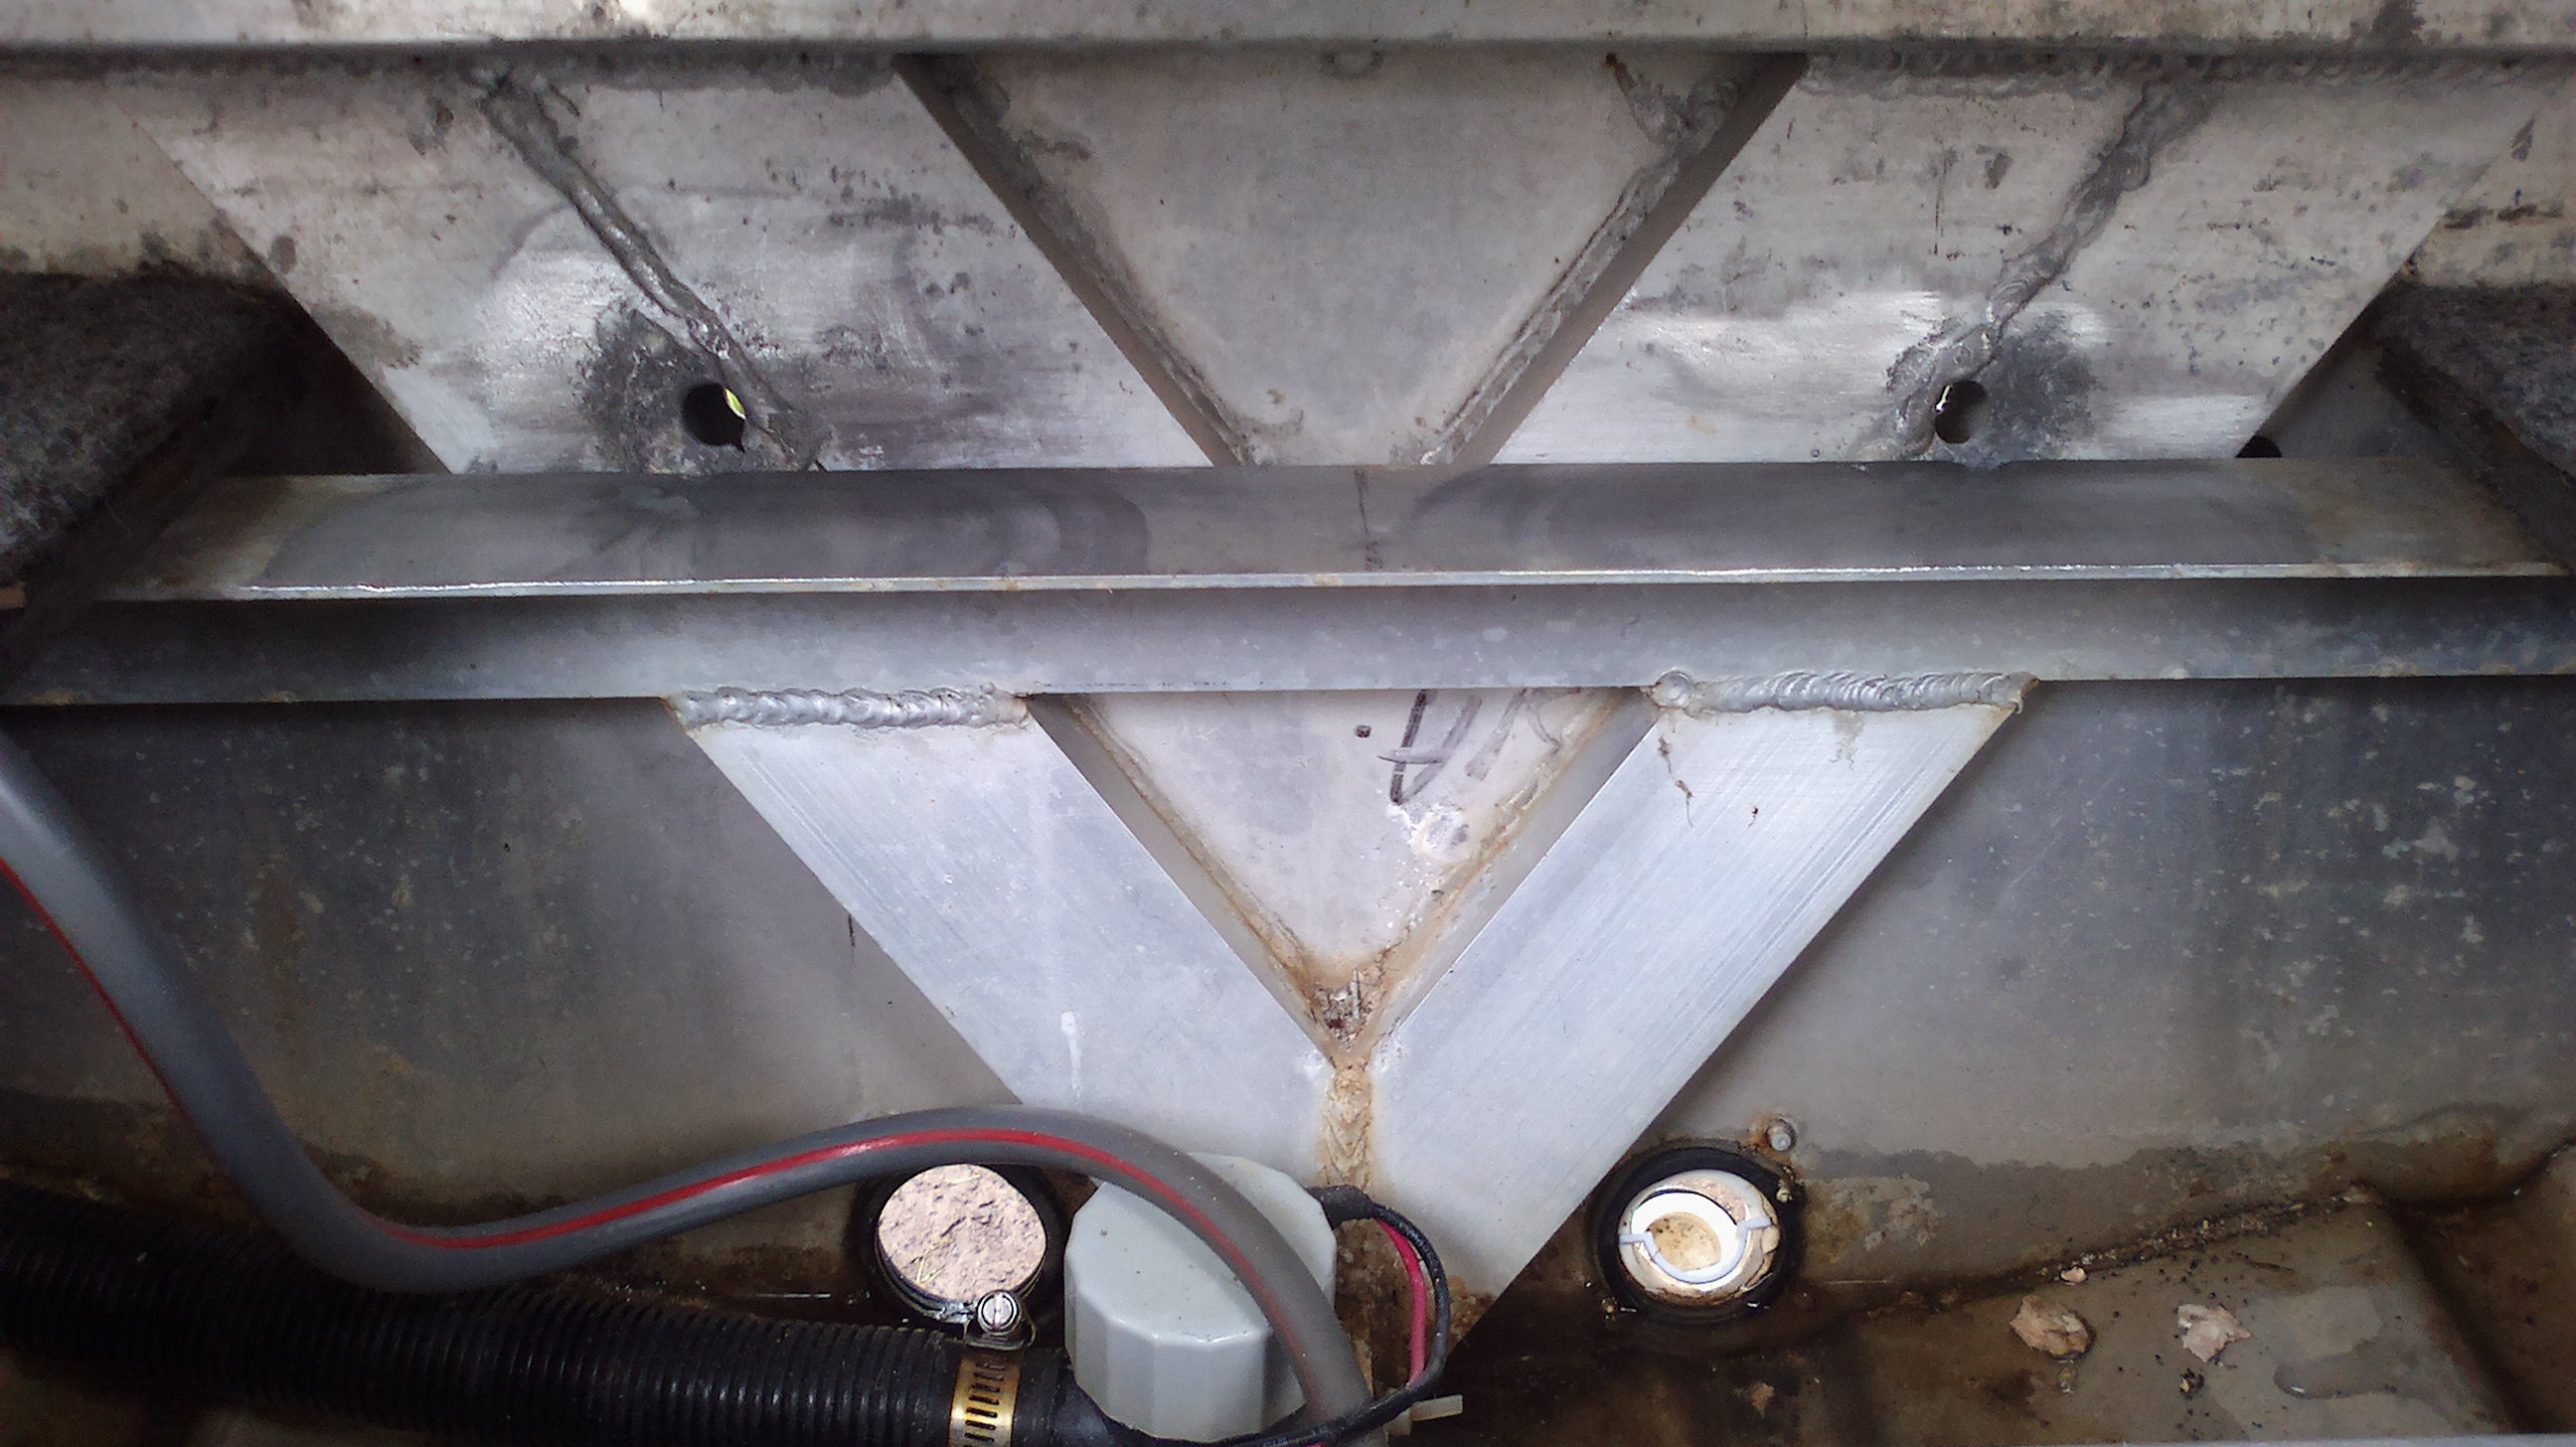 Aluminium Transom Corrosion - Repair Advice | Fishing - Fishwrecked.com - Fishing WA. Fishing ...